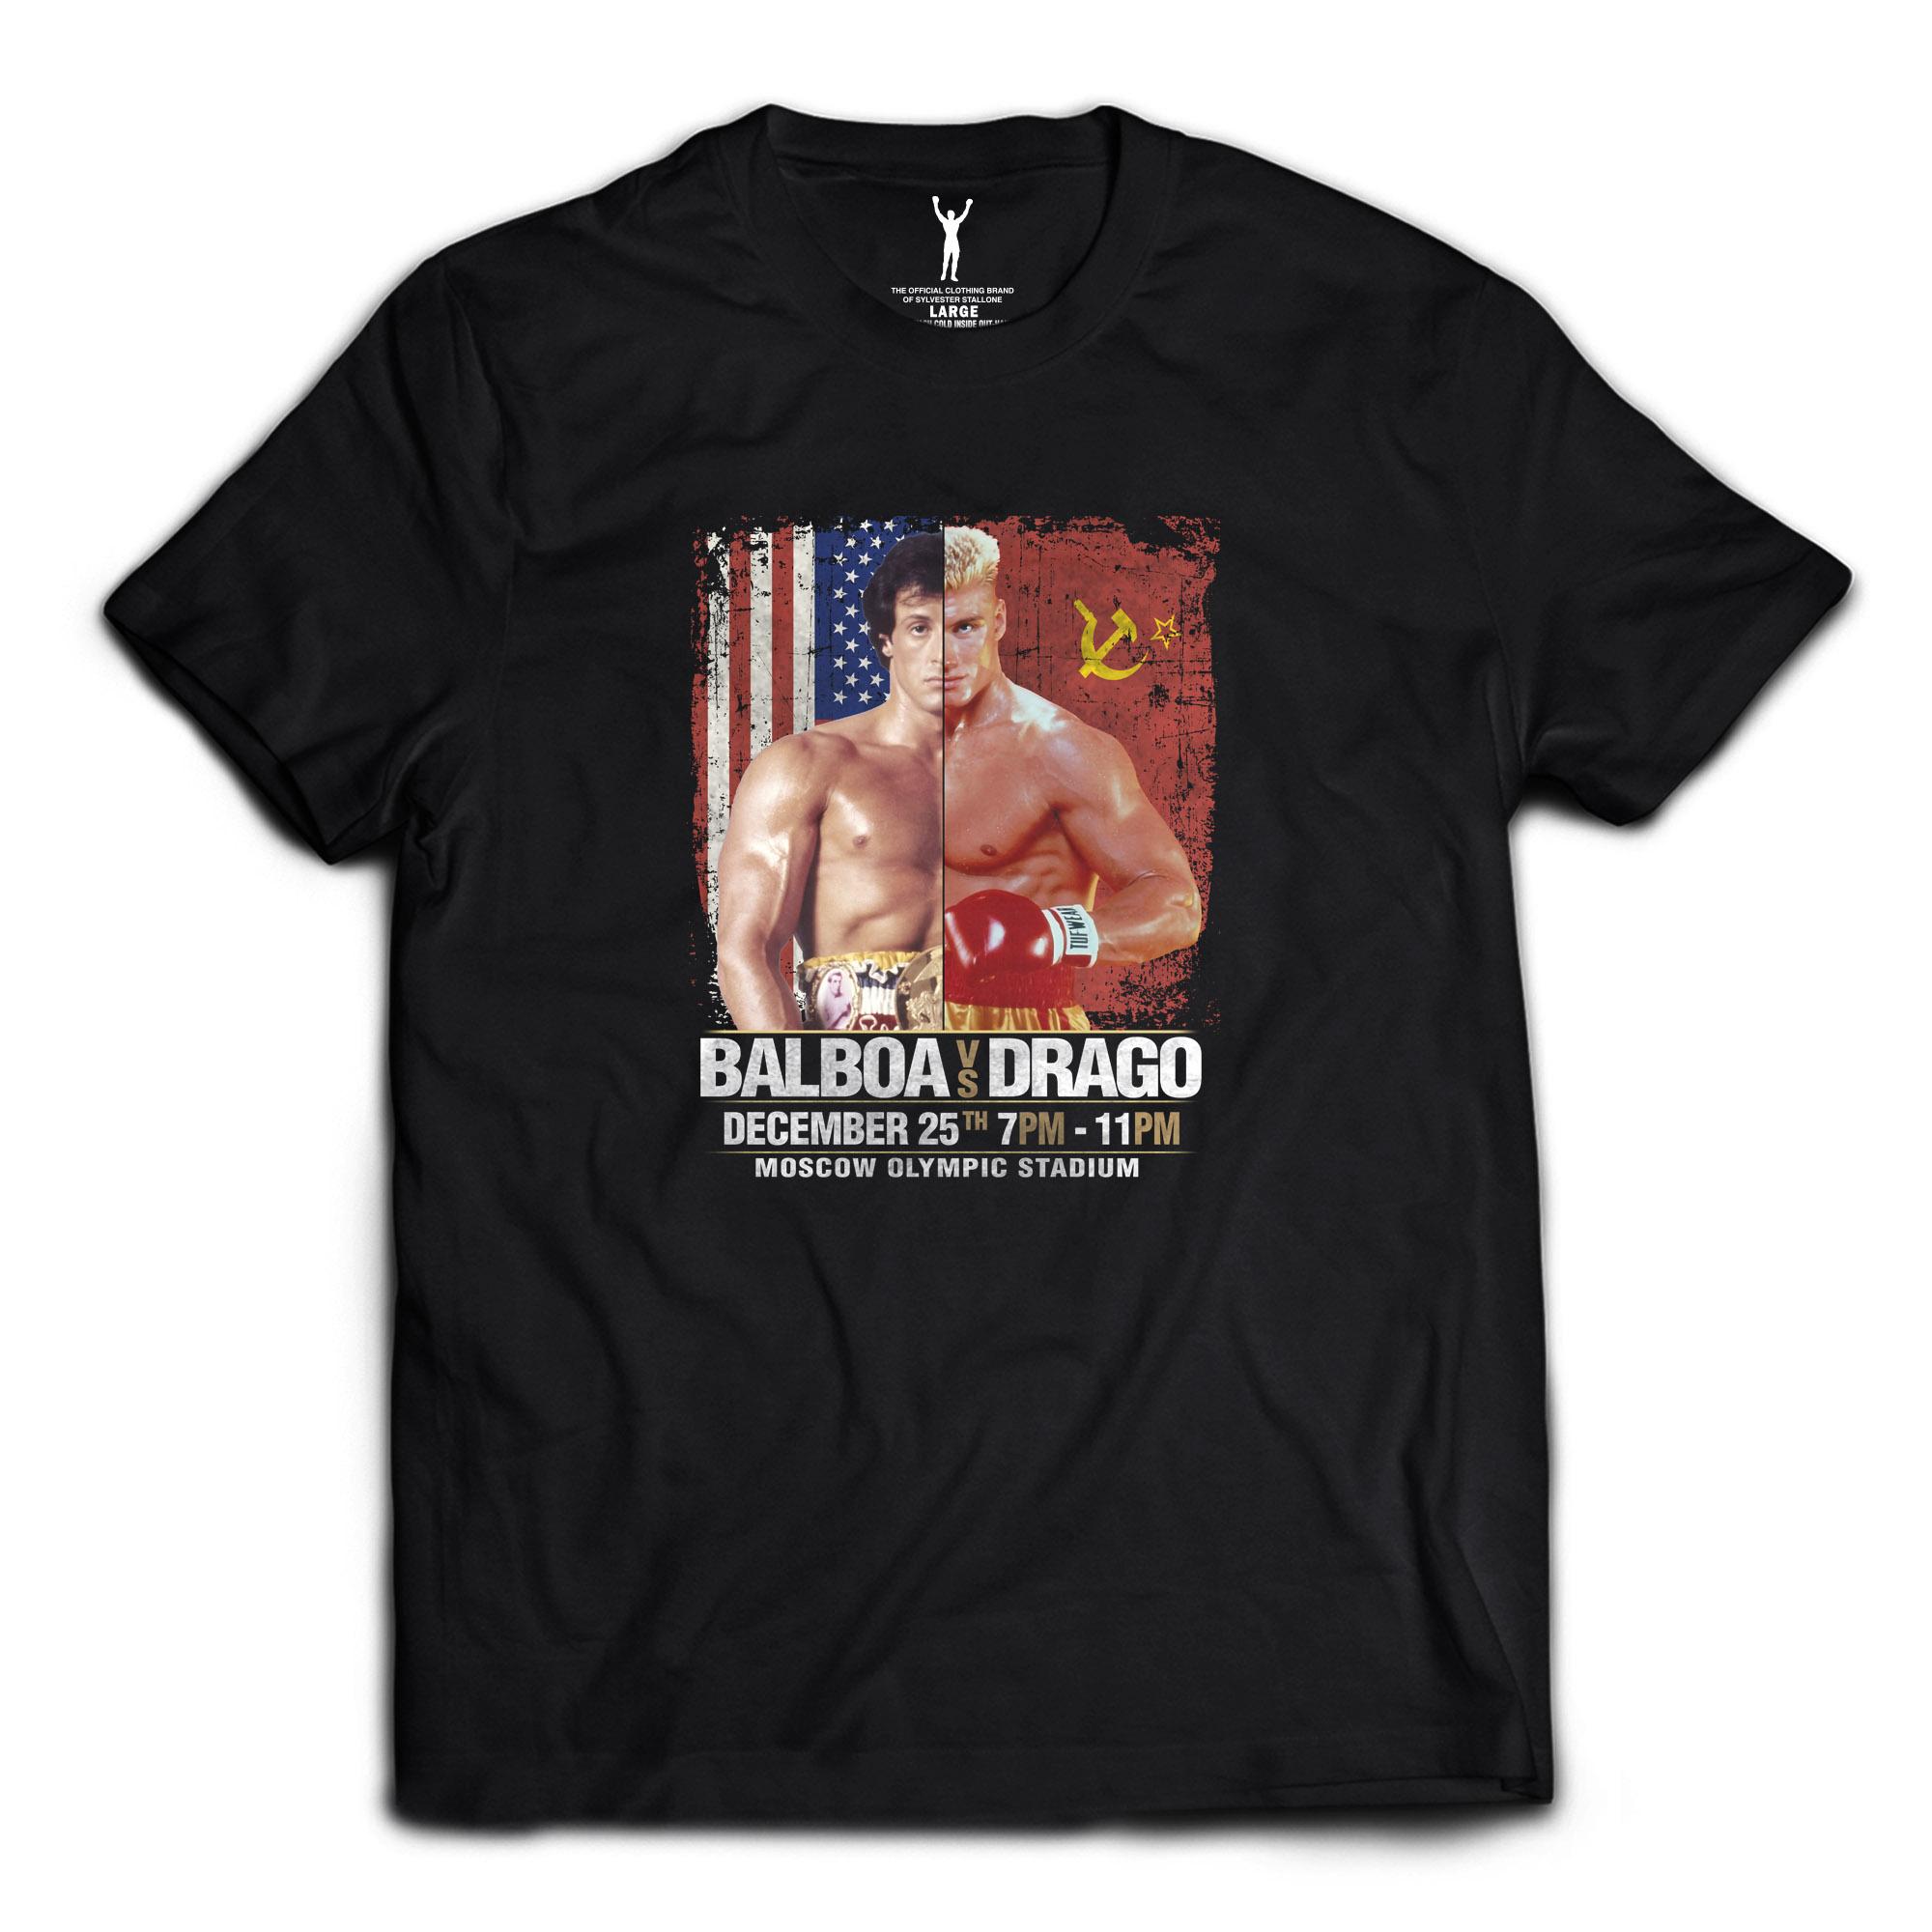 Balboa vs. Drago Tee